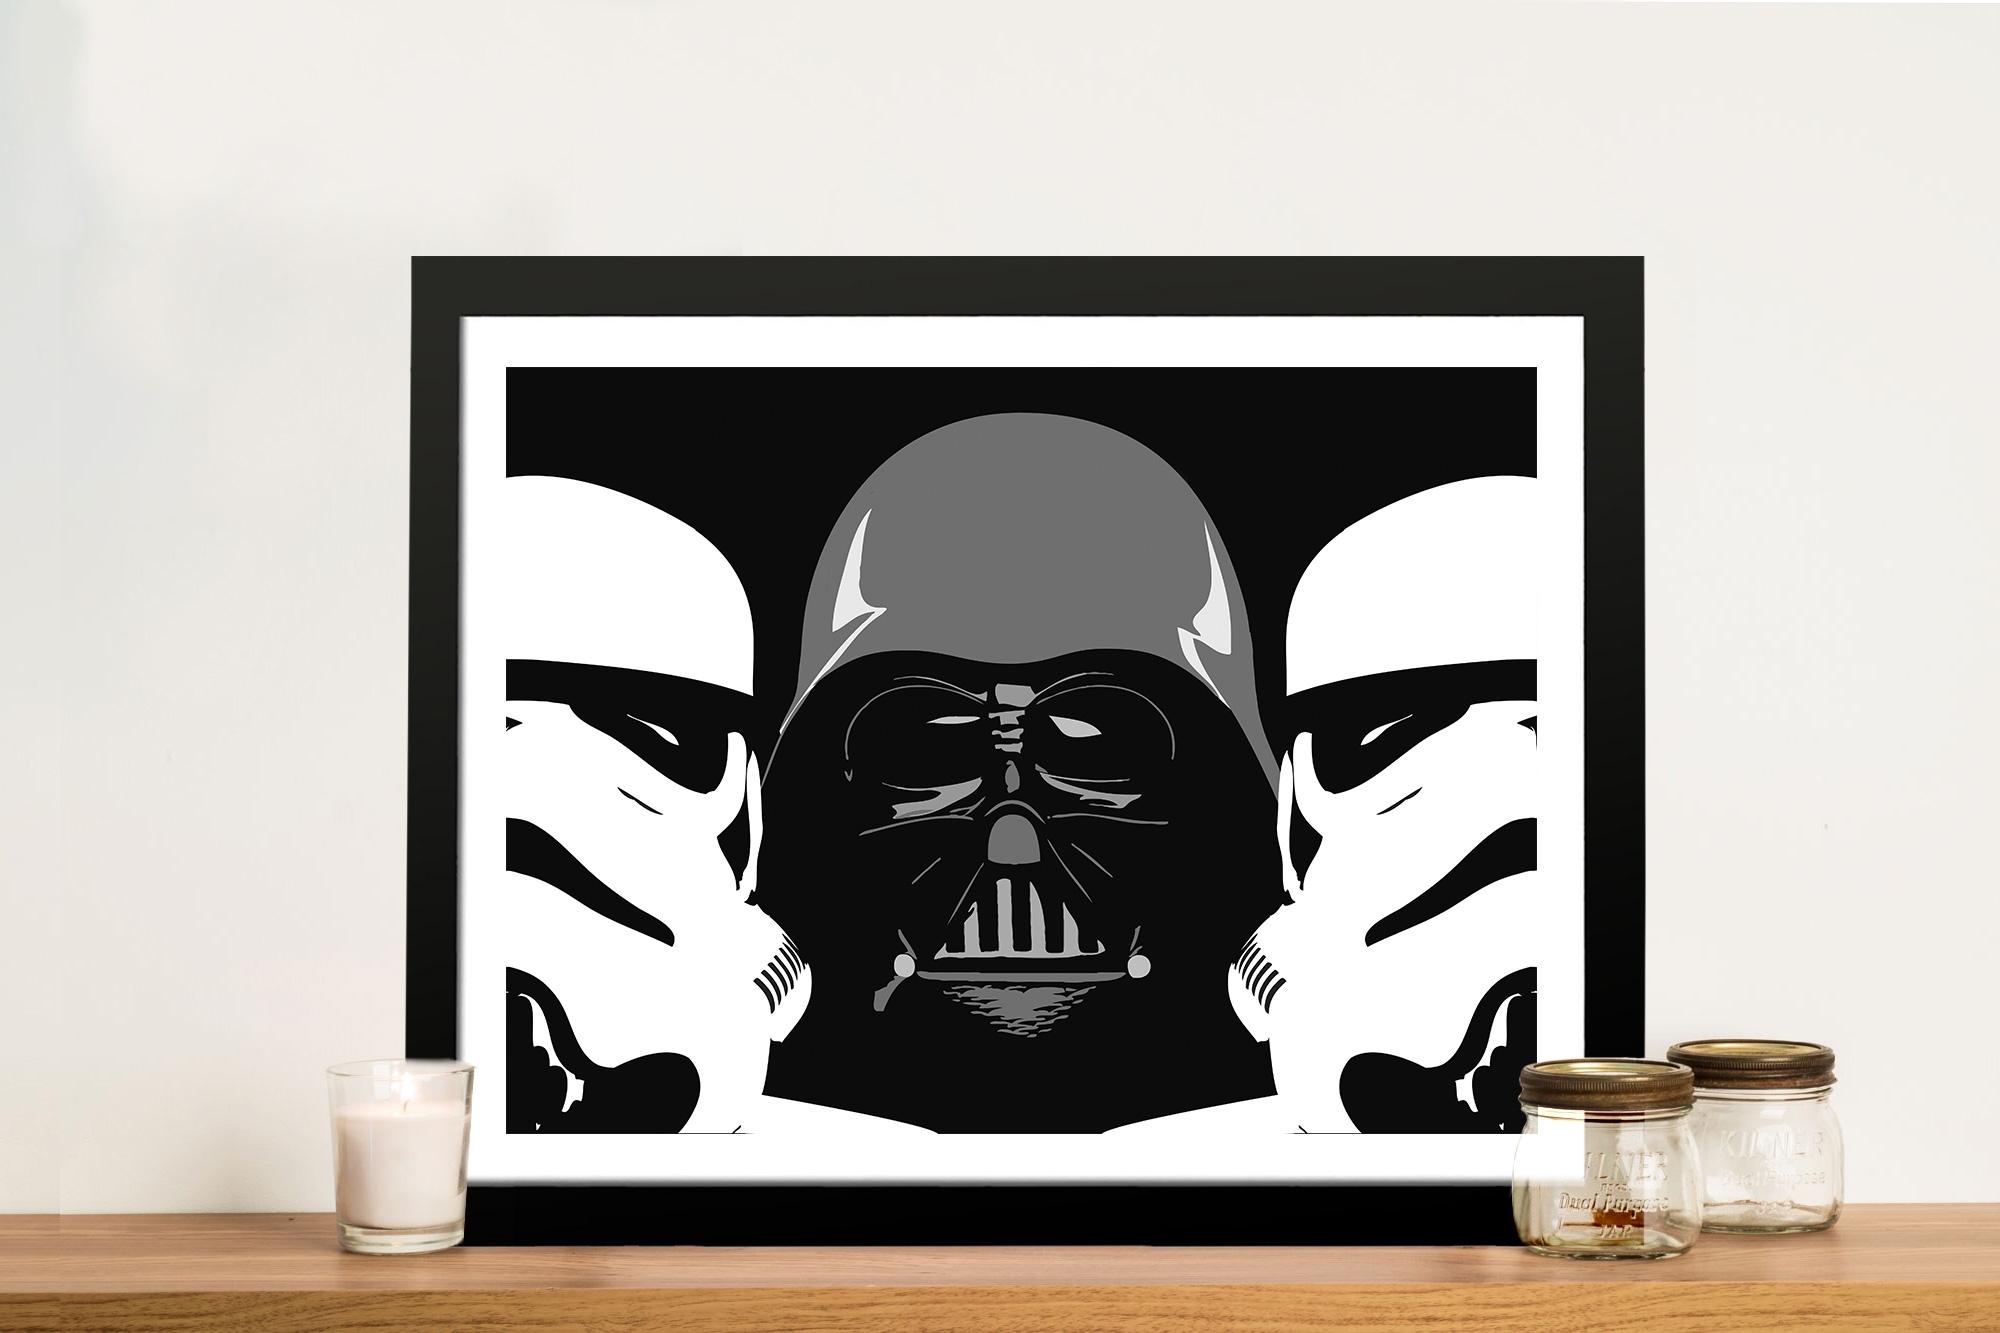 Three Amigos Darth Vader Wall Art – Canvas Prints Australia Regarding 2018 Darth Vader Wall Art (View 4 of 20)